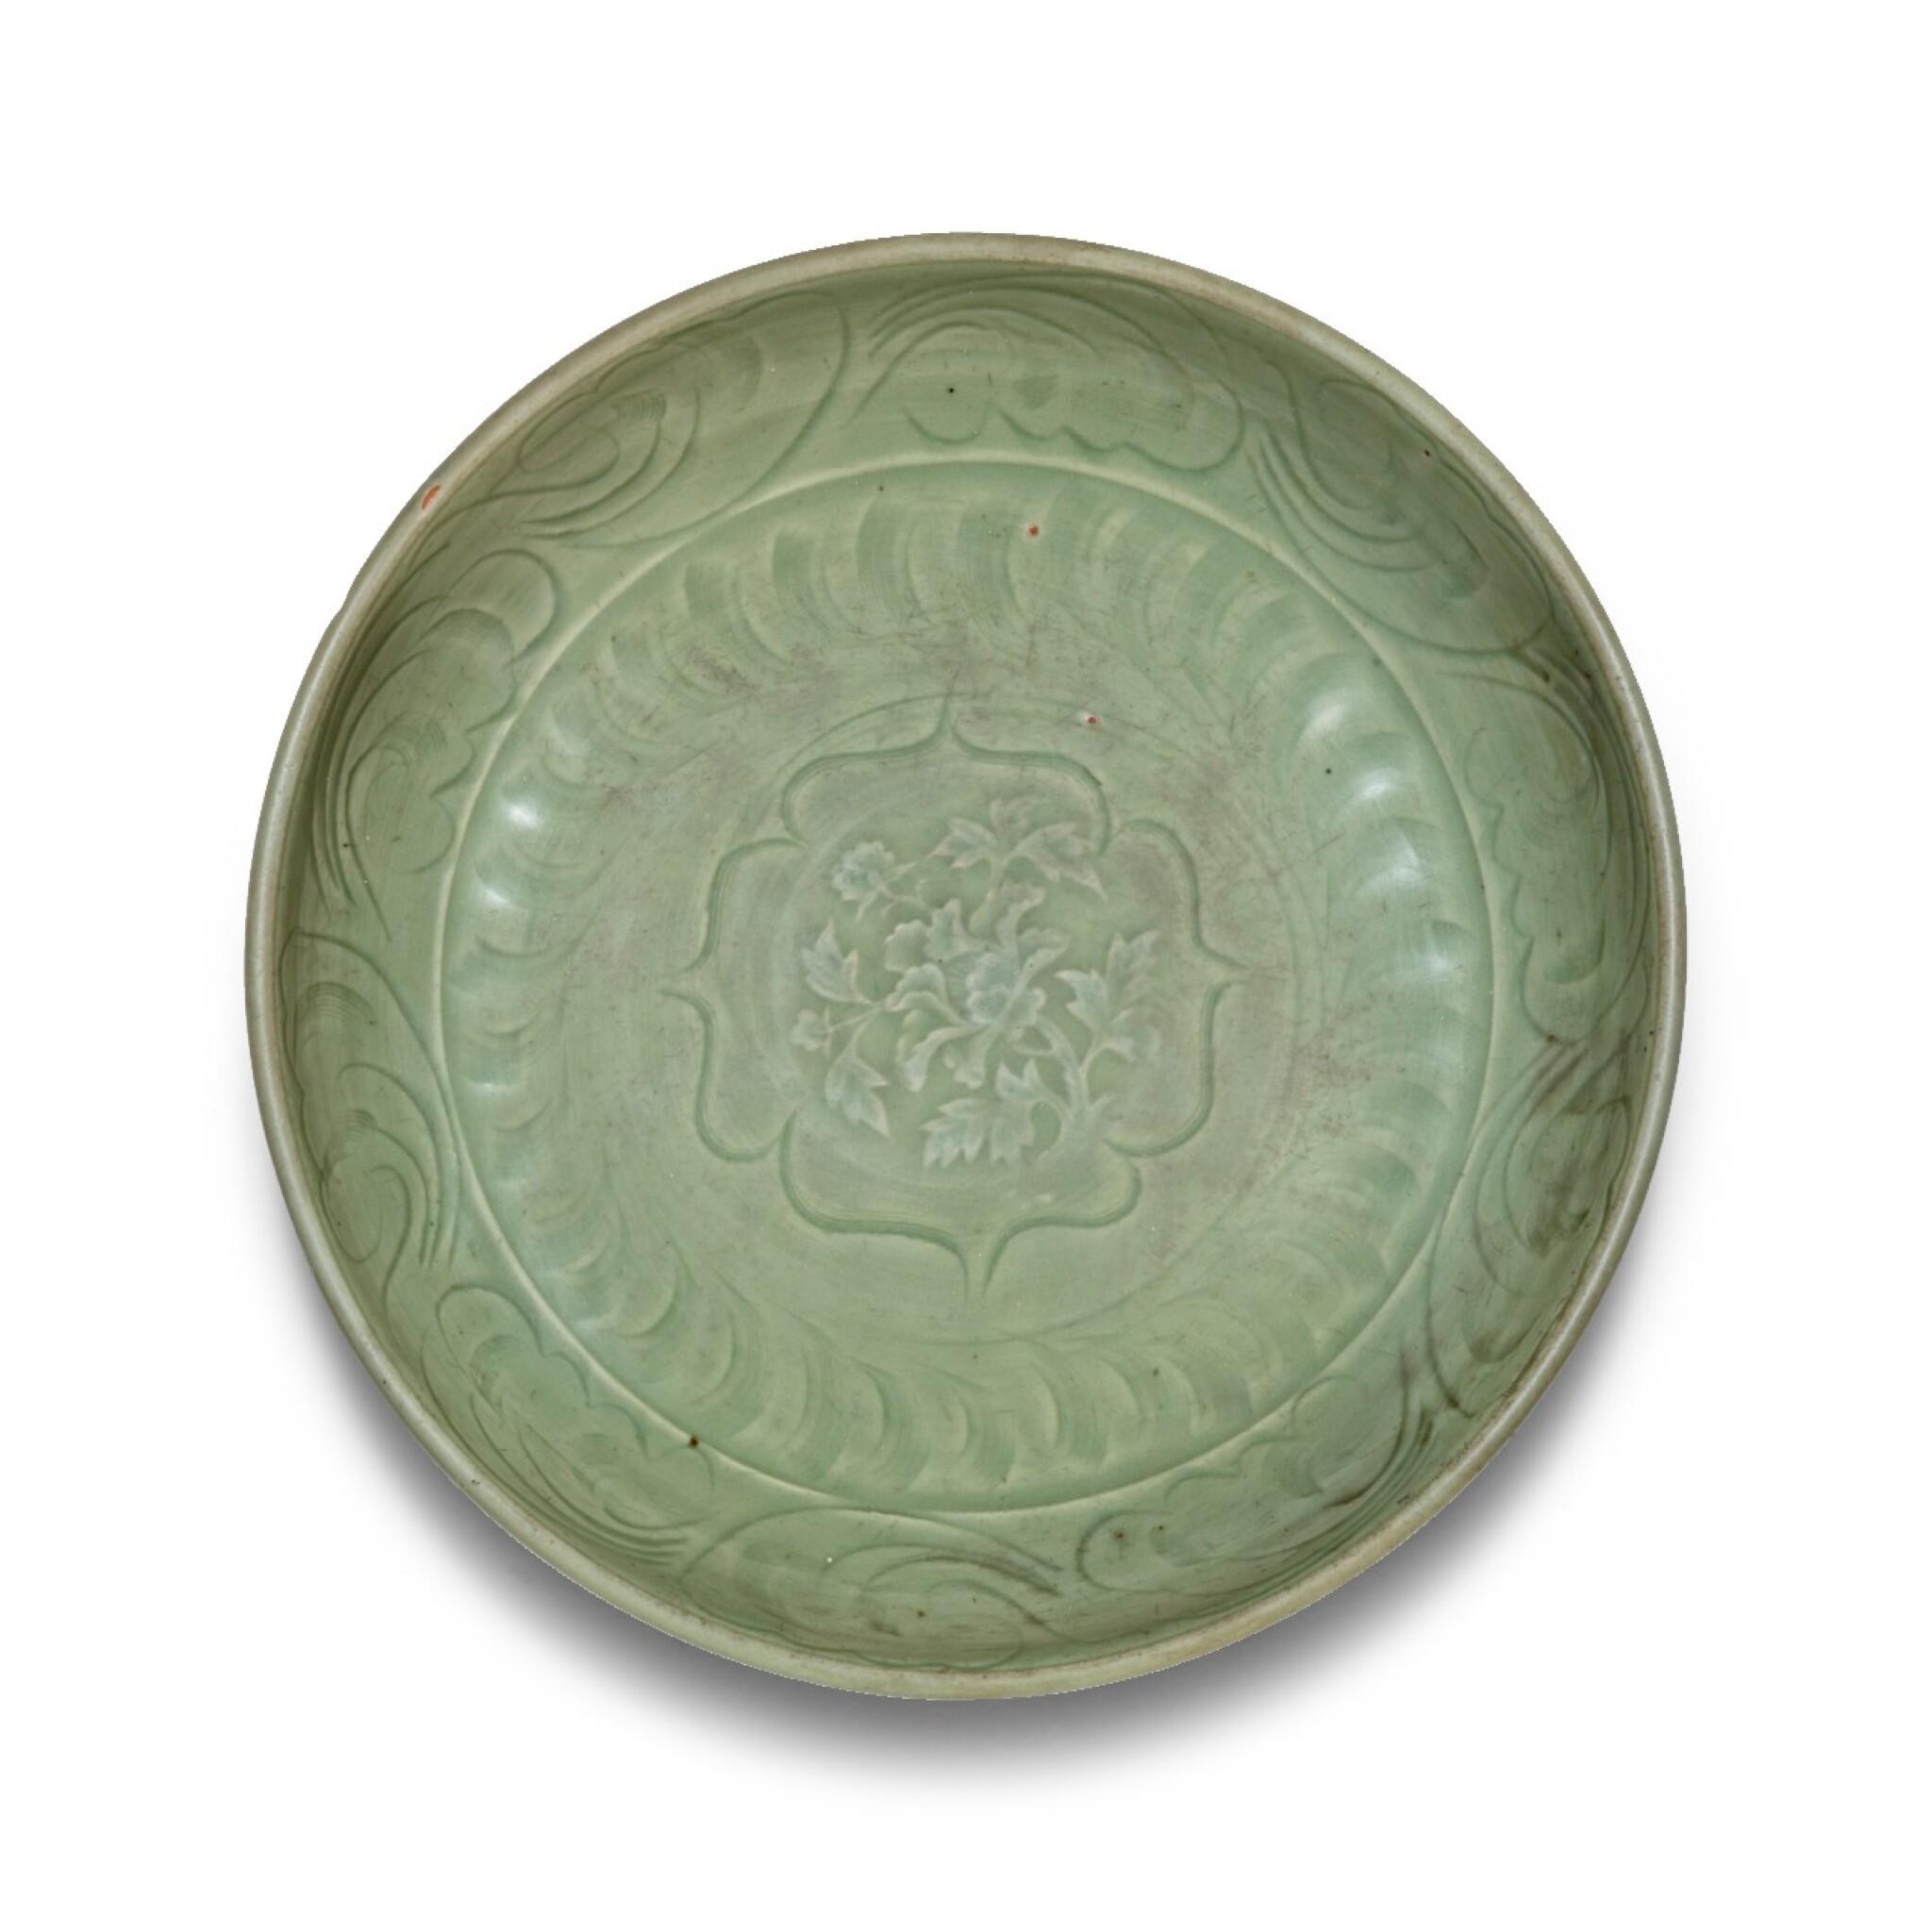 View 1 of Lot 4. Plat en grès céladon Longquan Dynastie Ming | 明 龍泉窰青釉刻花卉紋盤 | A Longquan celadon 'lotus' charger, Ming Dynasty.